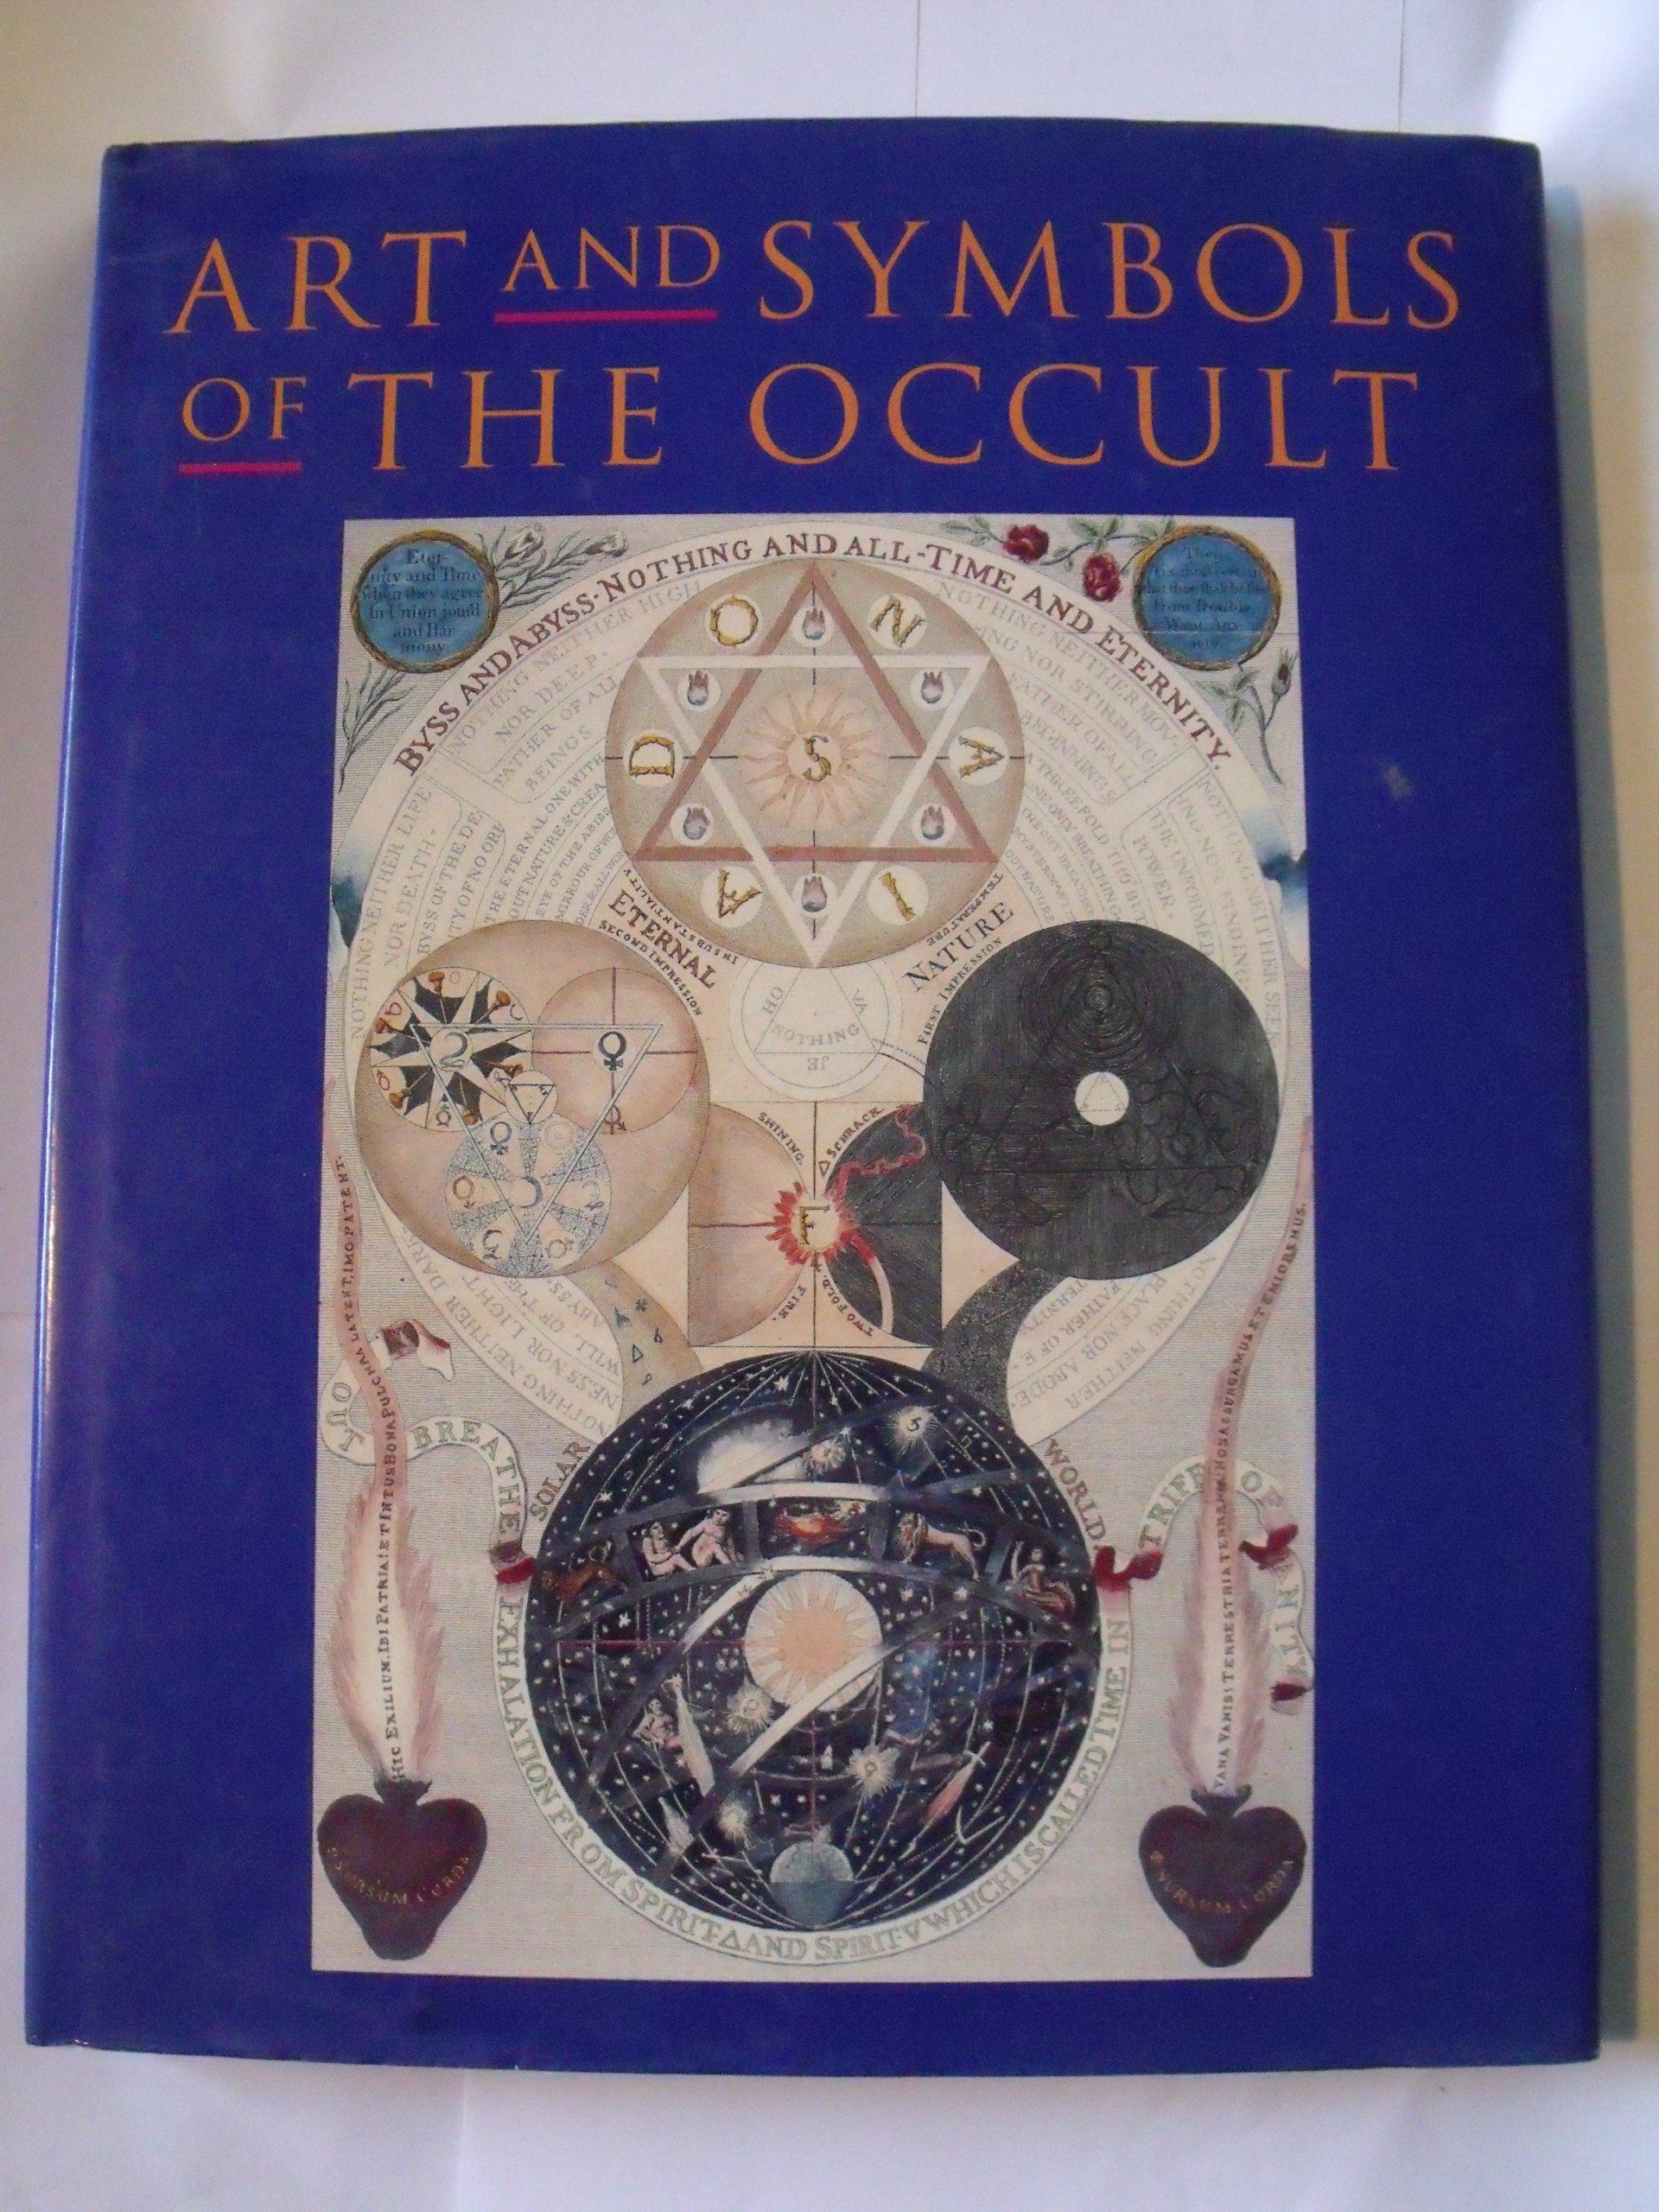 Art and symbols of the occult james wasserman 9781855013056 art and symbols of the occult james wasserman 9781855013056 amazon books buycottarizona